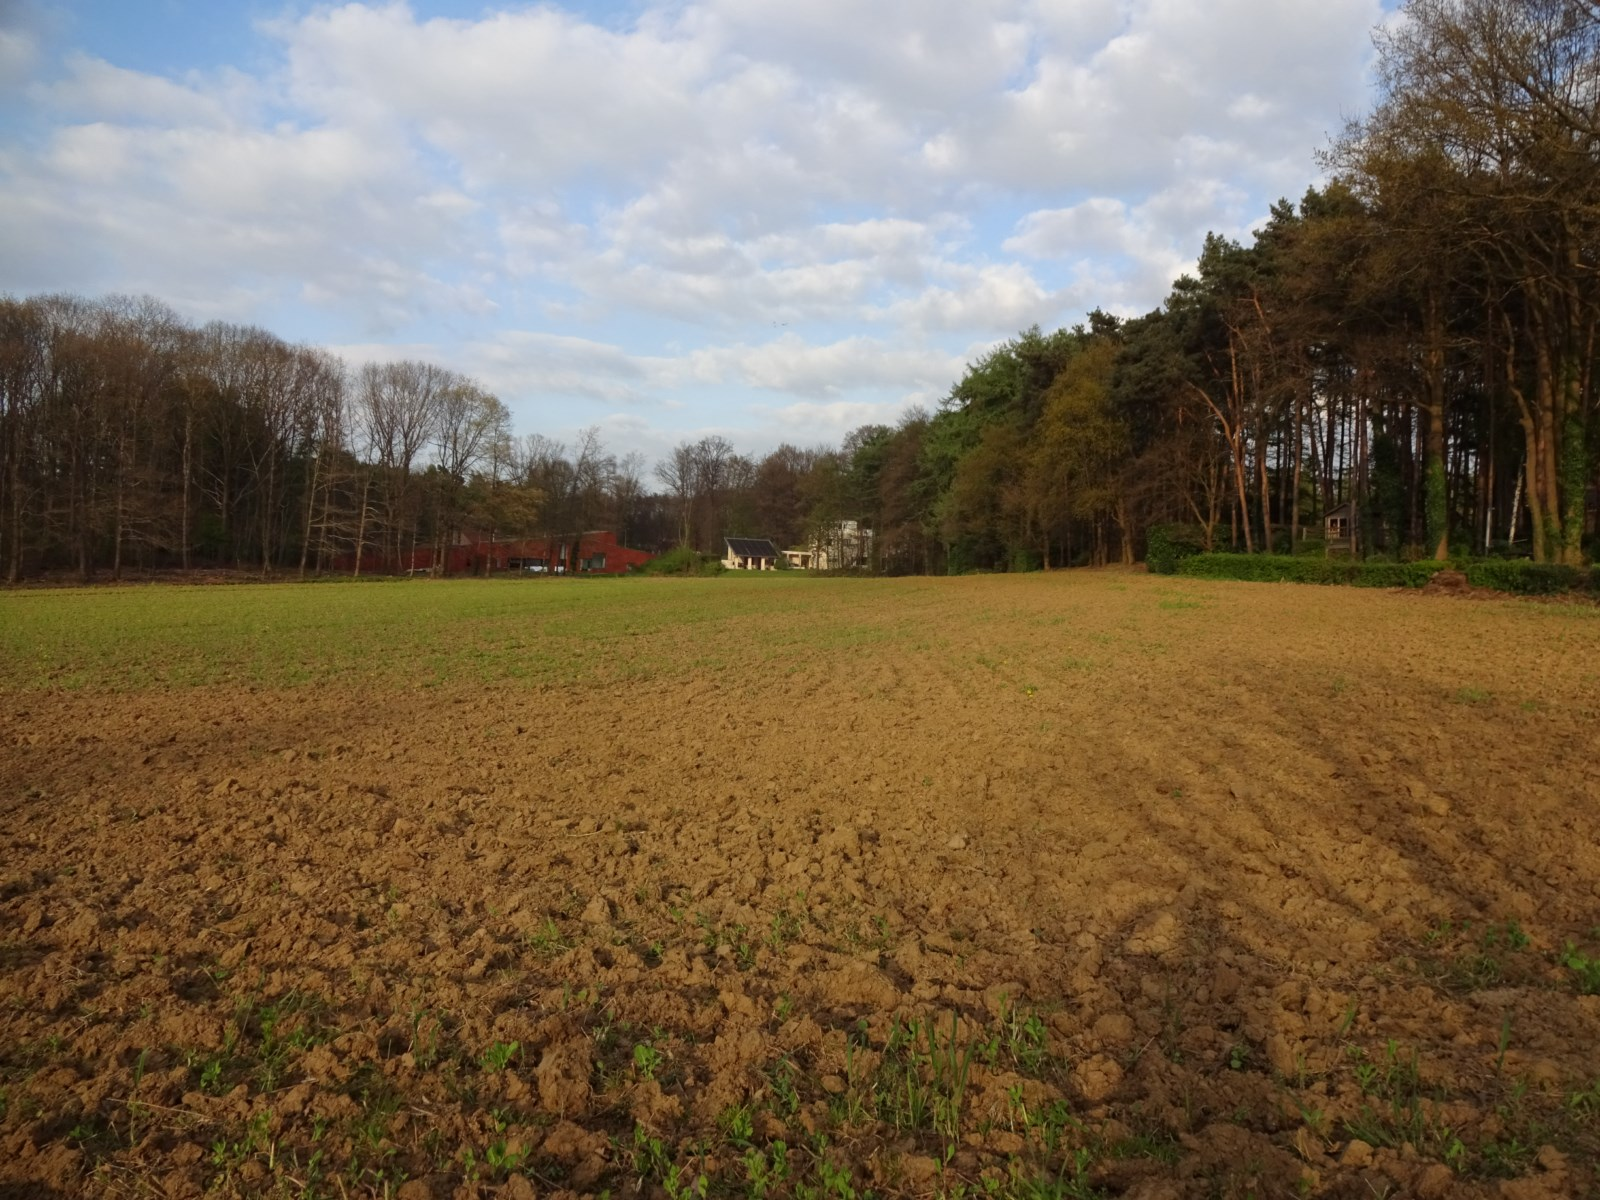 Landbouwgrond te lubbeeklandbouwgrond te koop for Landbouwgrond te koop oost vlaanderen